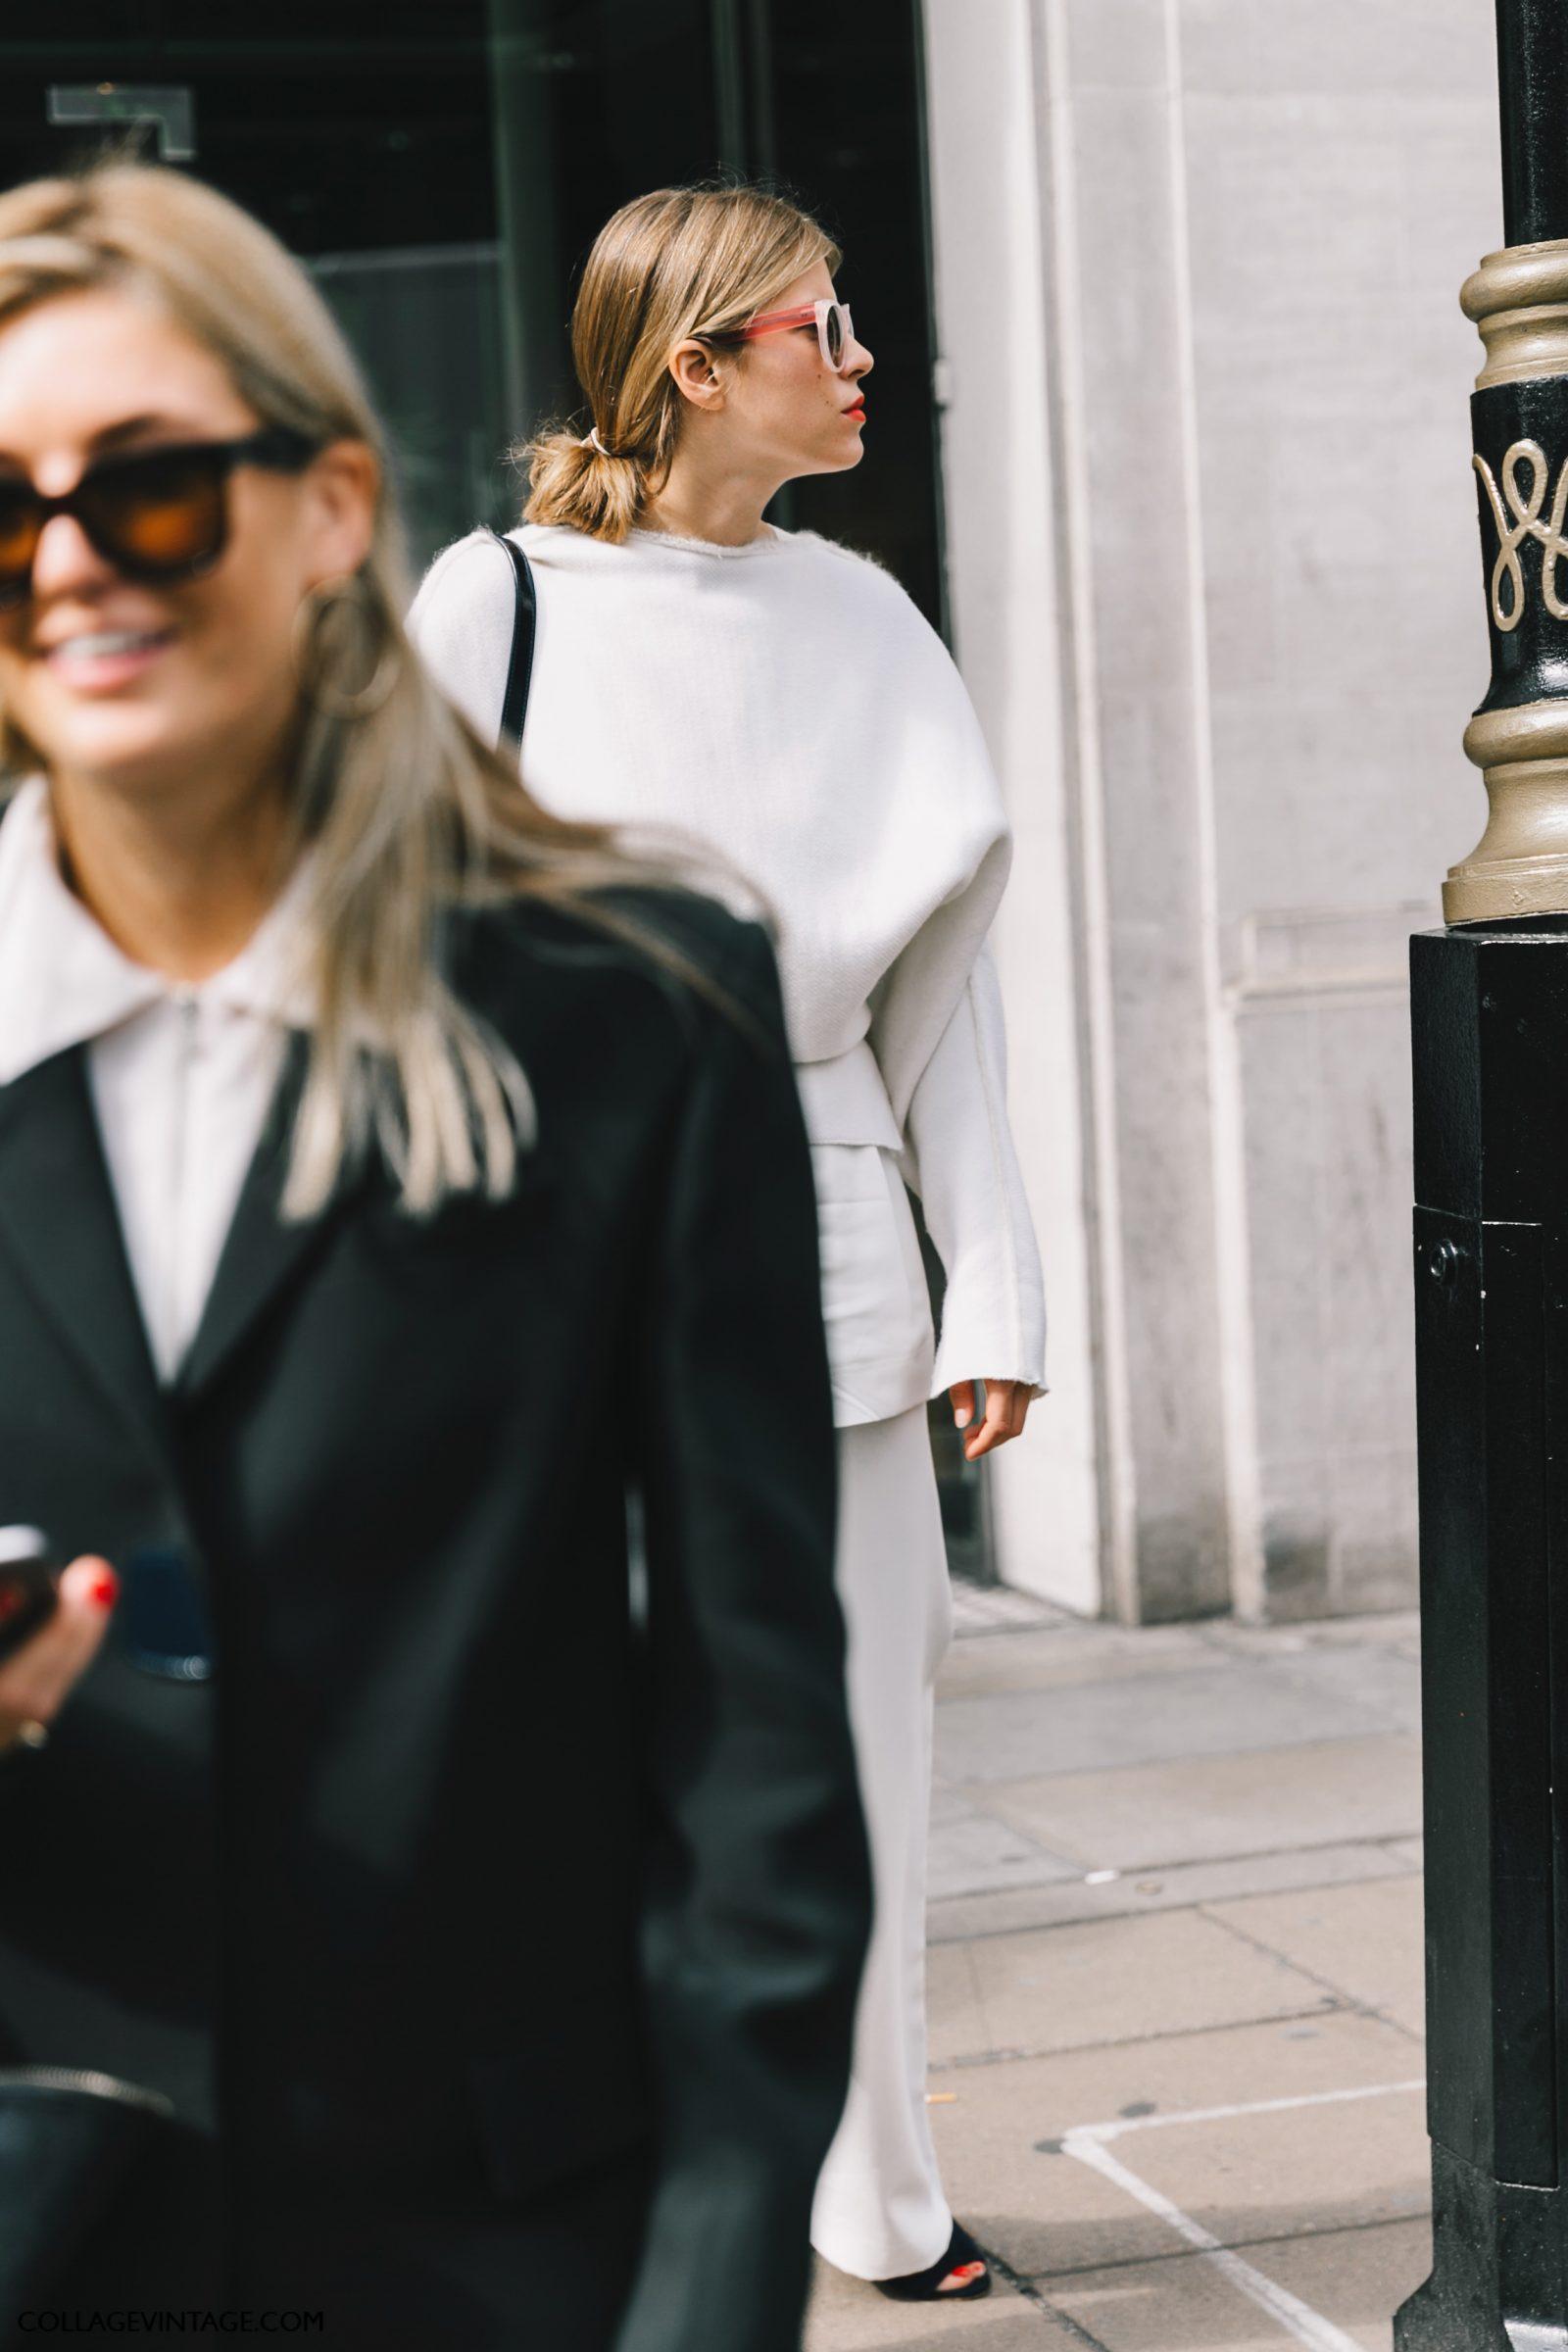 lfw-london_fashion_week_ss17-street_style-outfits-collage_vintage-vintage-roksanda-christopher_kane-joseph-71